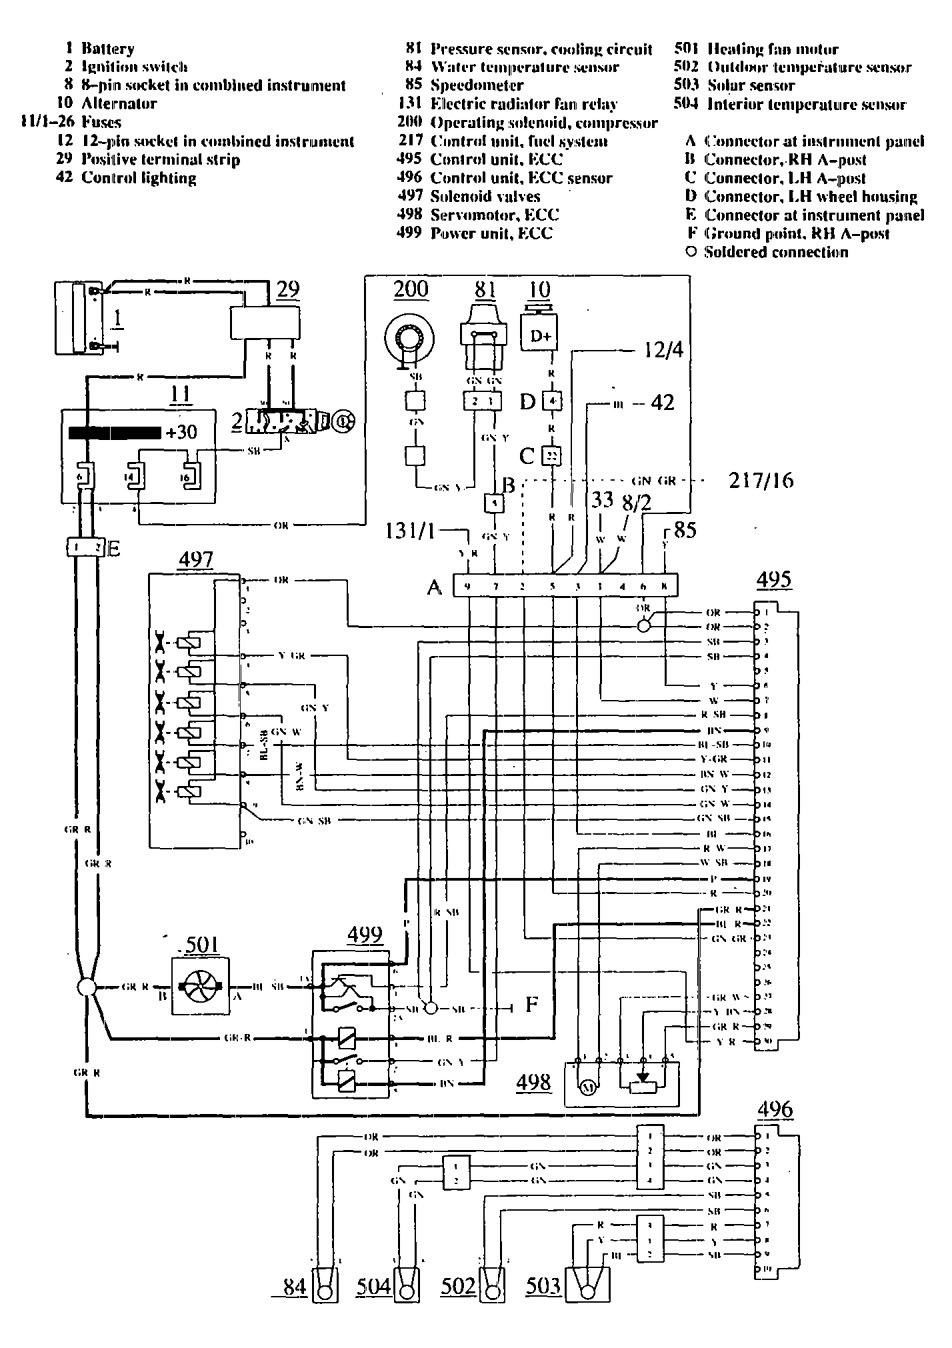 Volvo 780 Wiring Diagram - Wiring Diagram picture cross-culture -  cross-culture.agriturismodisicilia.it | Volvo 780 Wiring Diagram |  | Agriturismo Sicilia